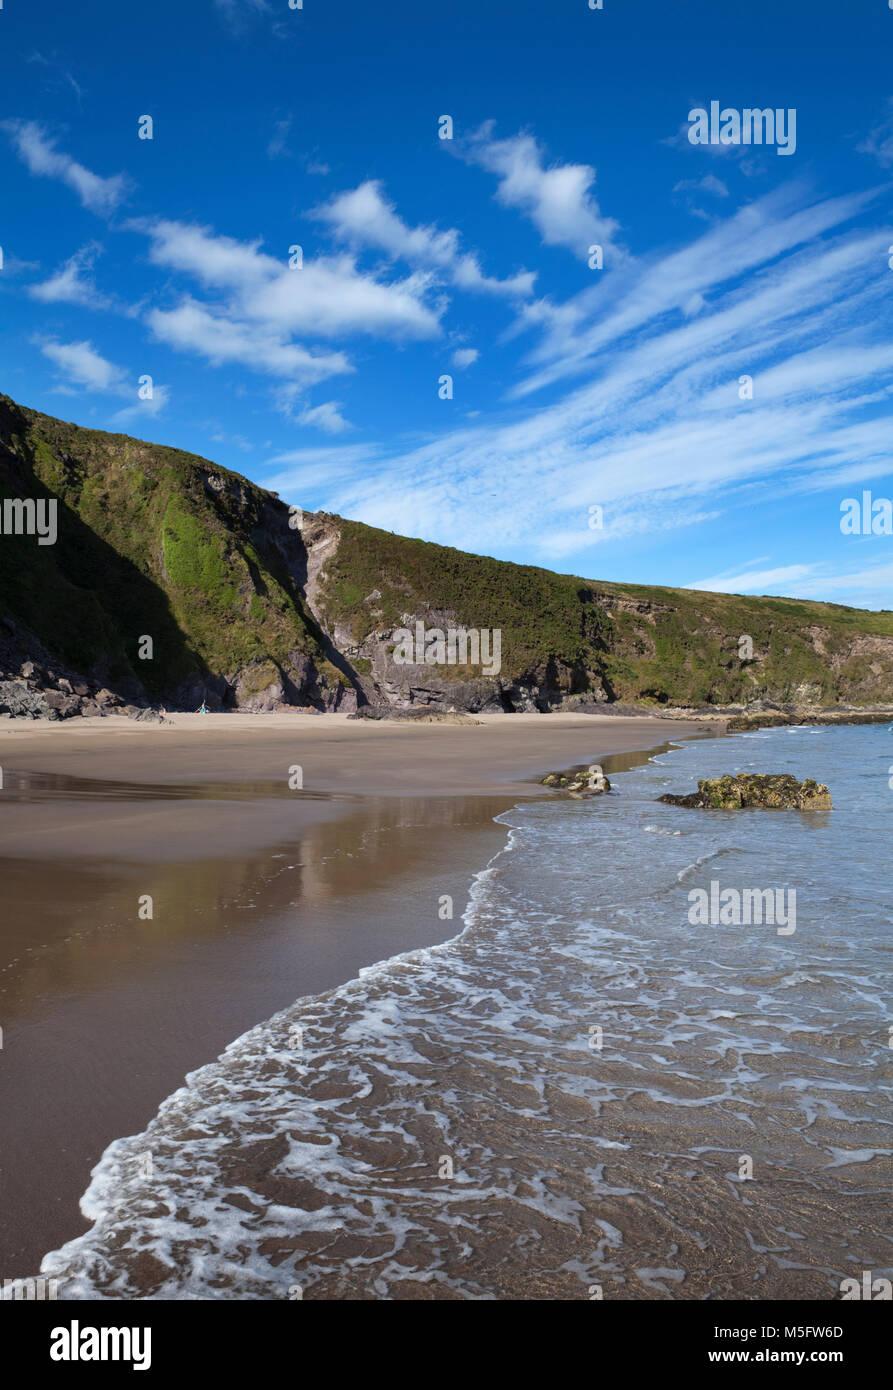 The Beach at Cill an Fhuarthainn, An Rinn or Ring Gaeltacht Region, County Waterford, Ireland - Stock Image